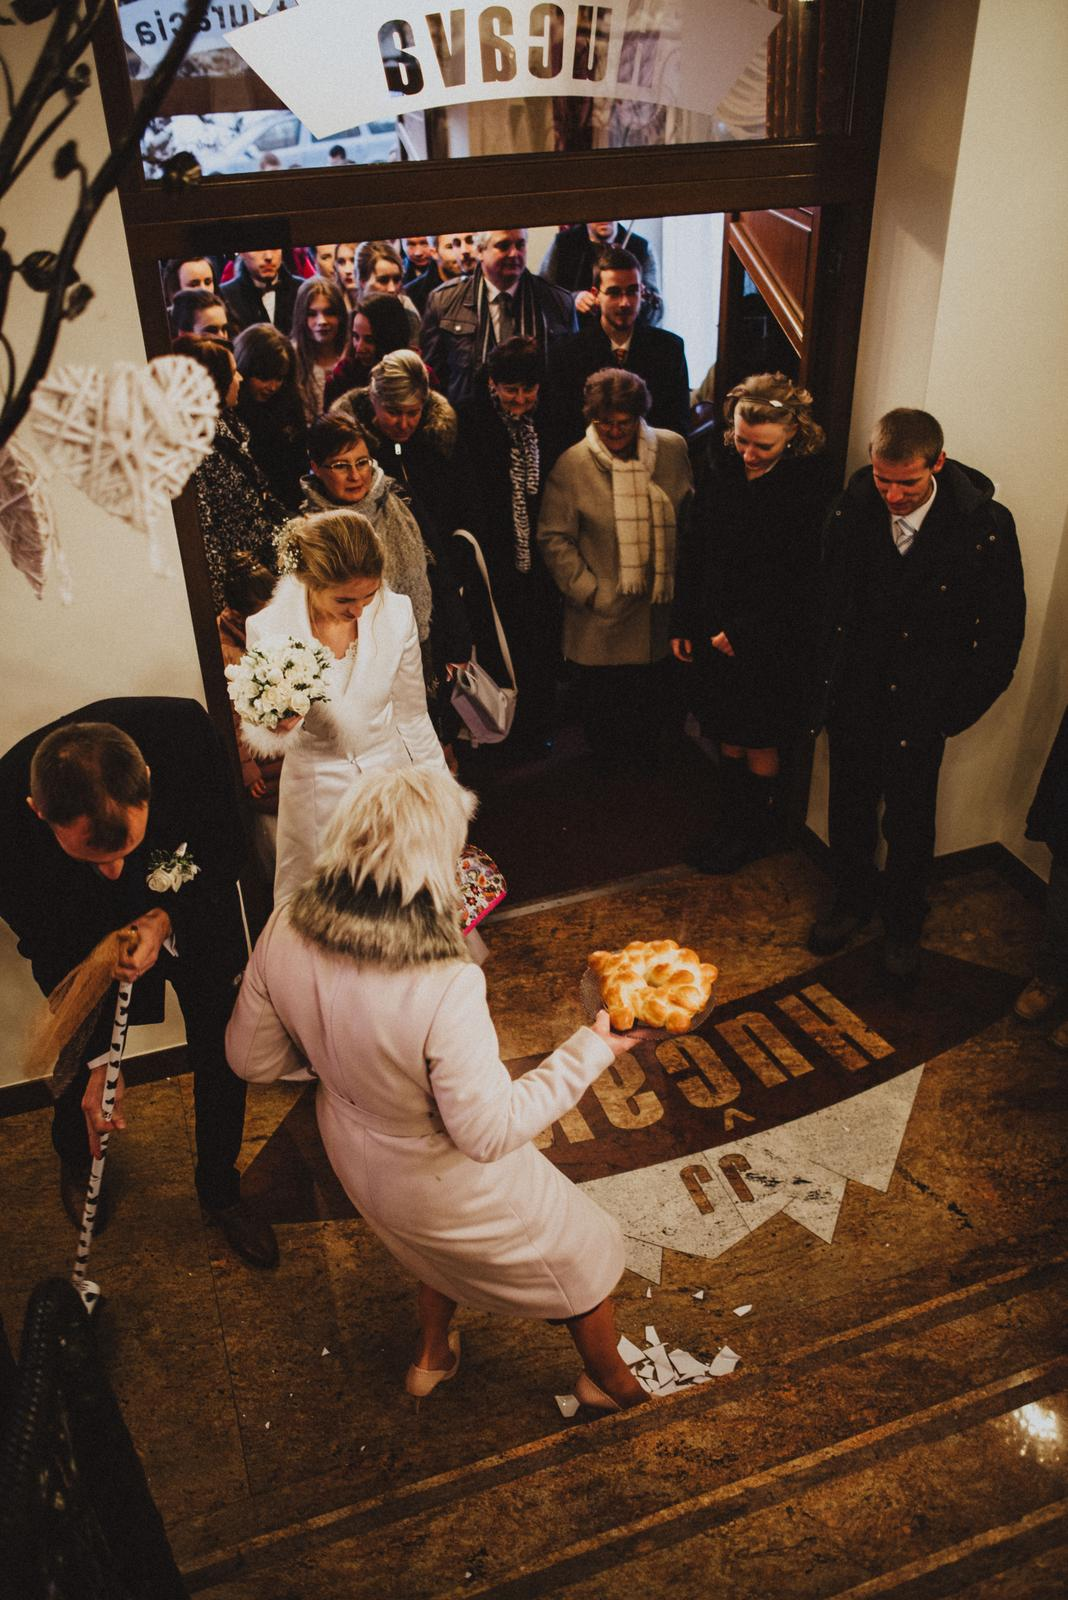 Tatranská zimná svadba - pletenec a štandardné zvyky